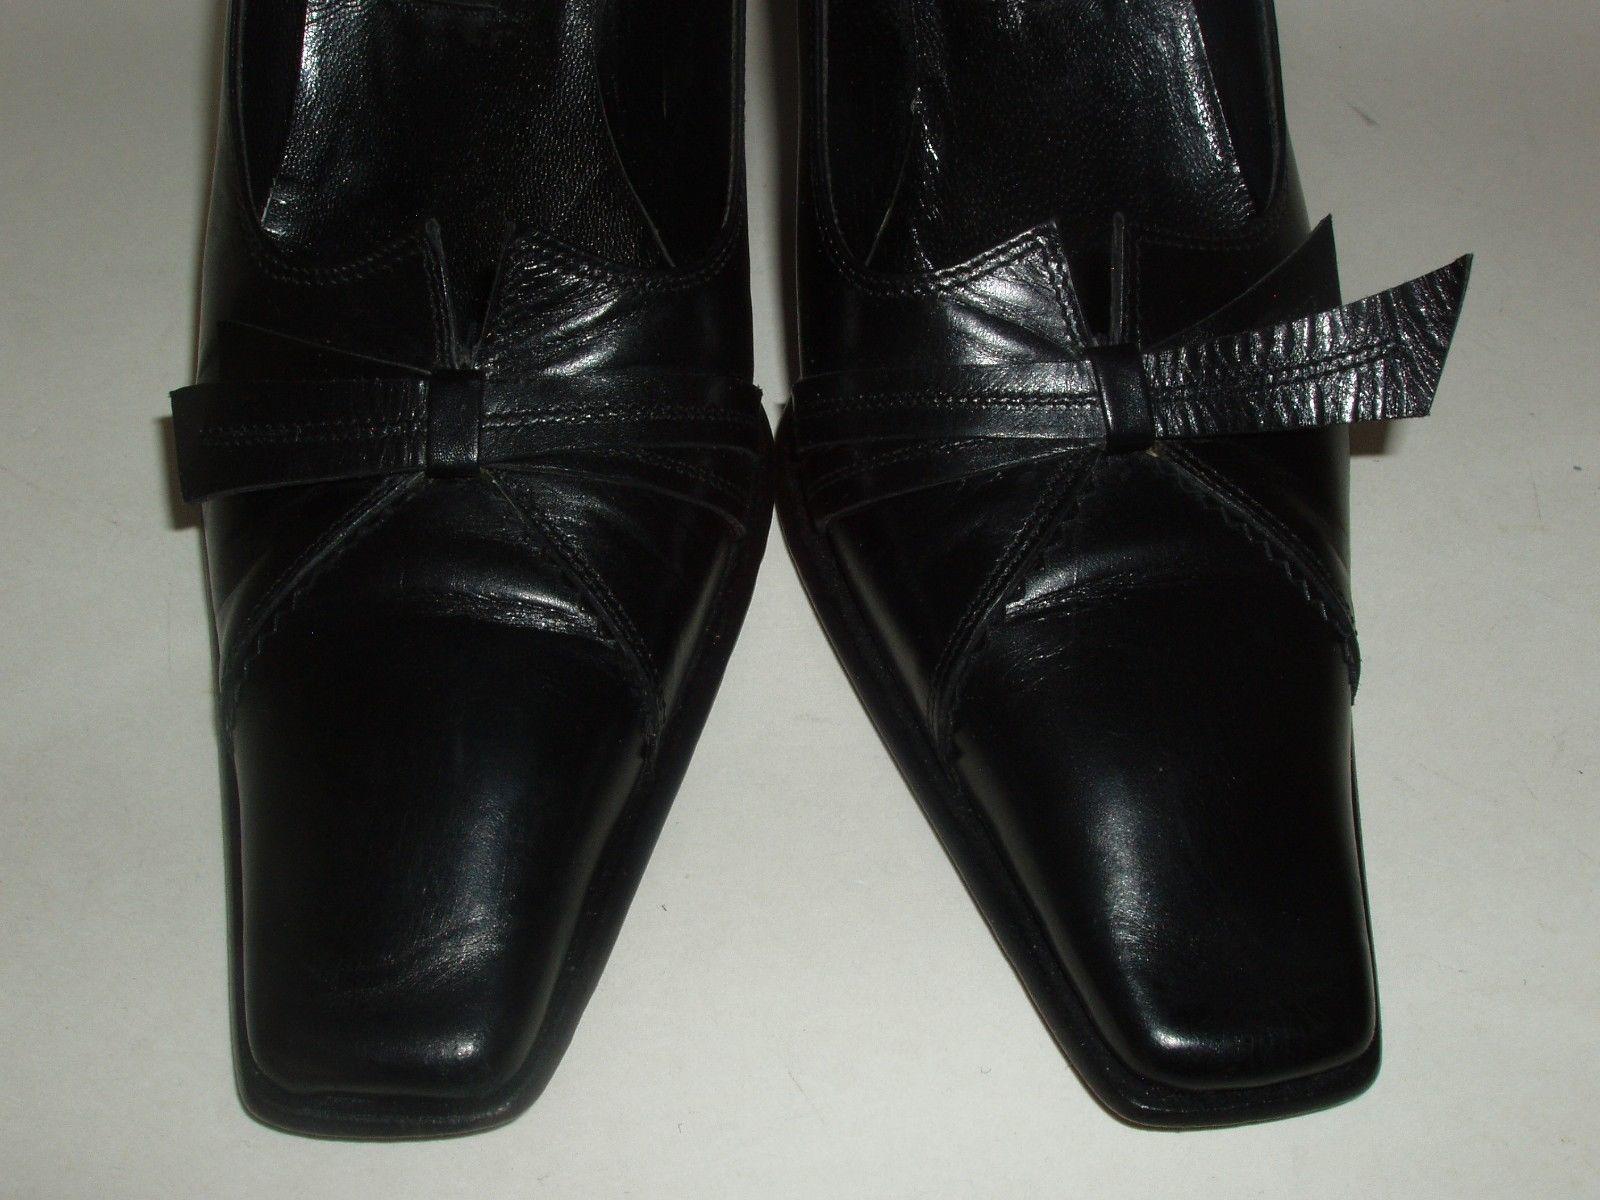 Roberto Botticelli Italian Made Black Leather High Heel Shoes Euro 37.5 US 7.5